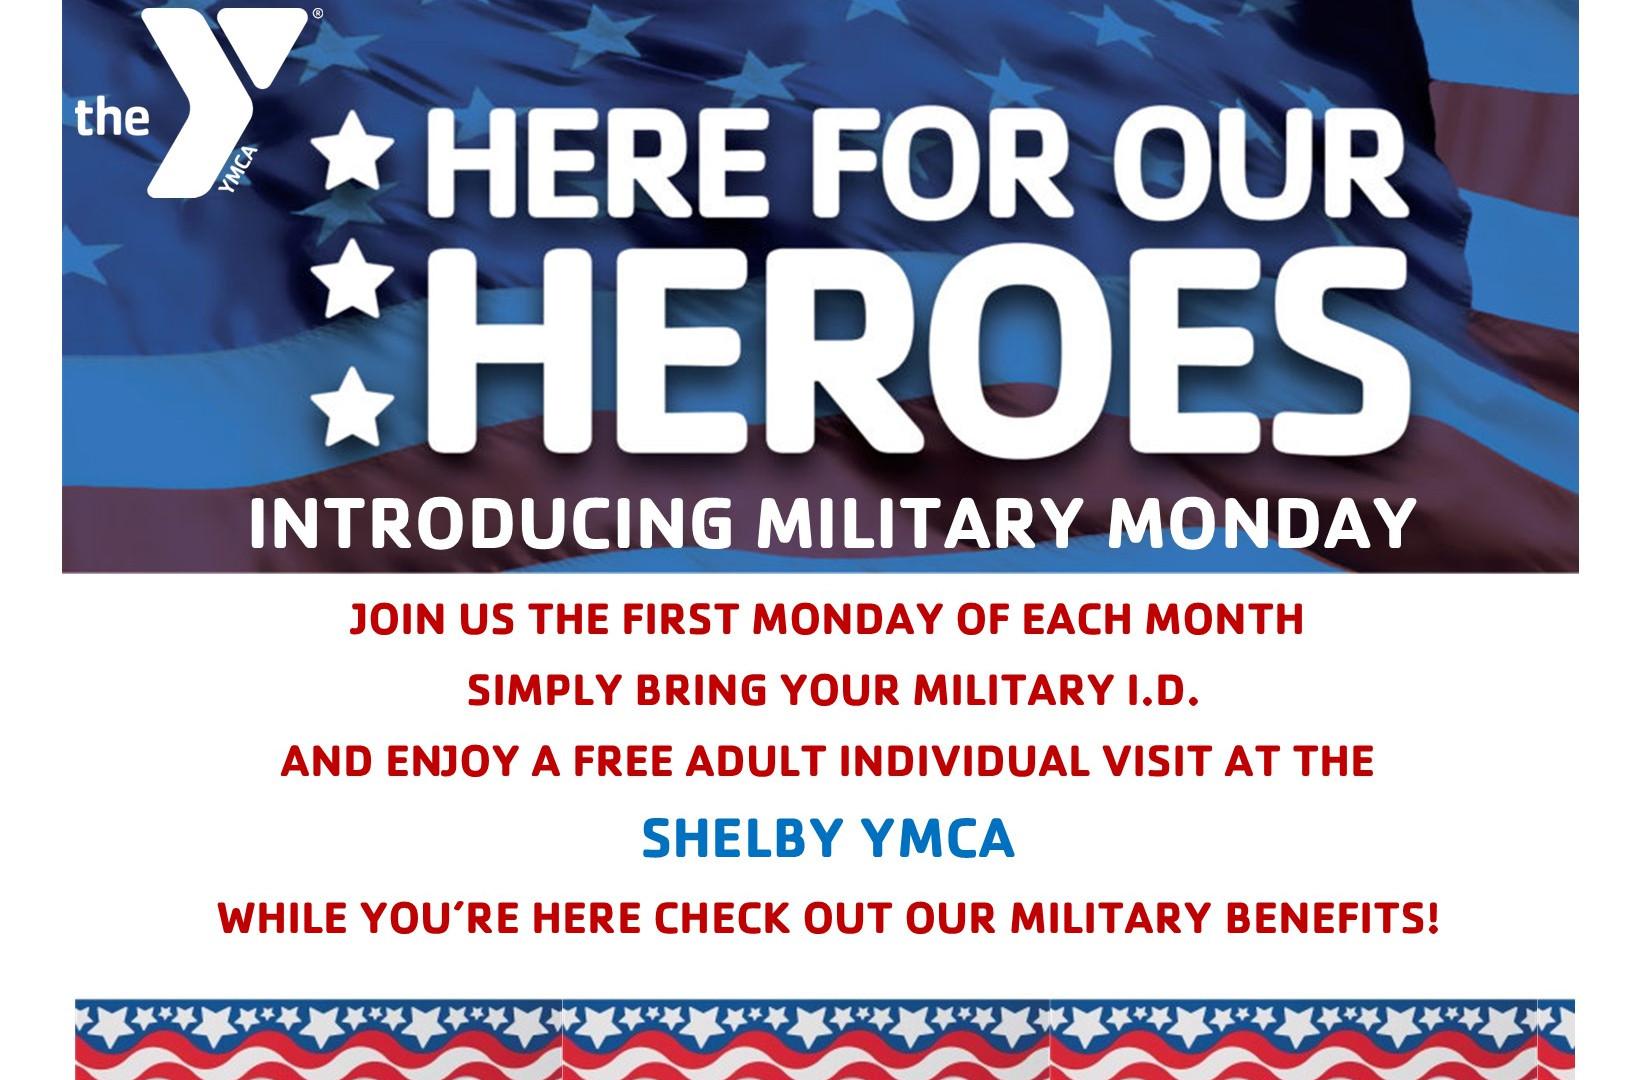 Military Mondays.jpg